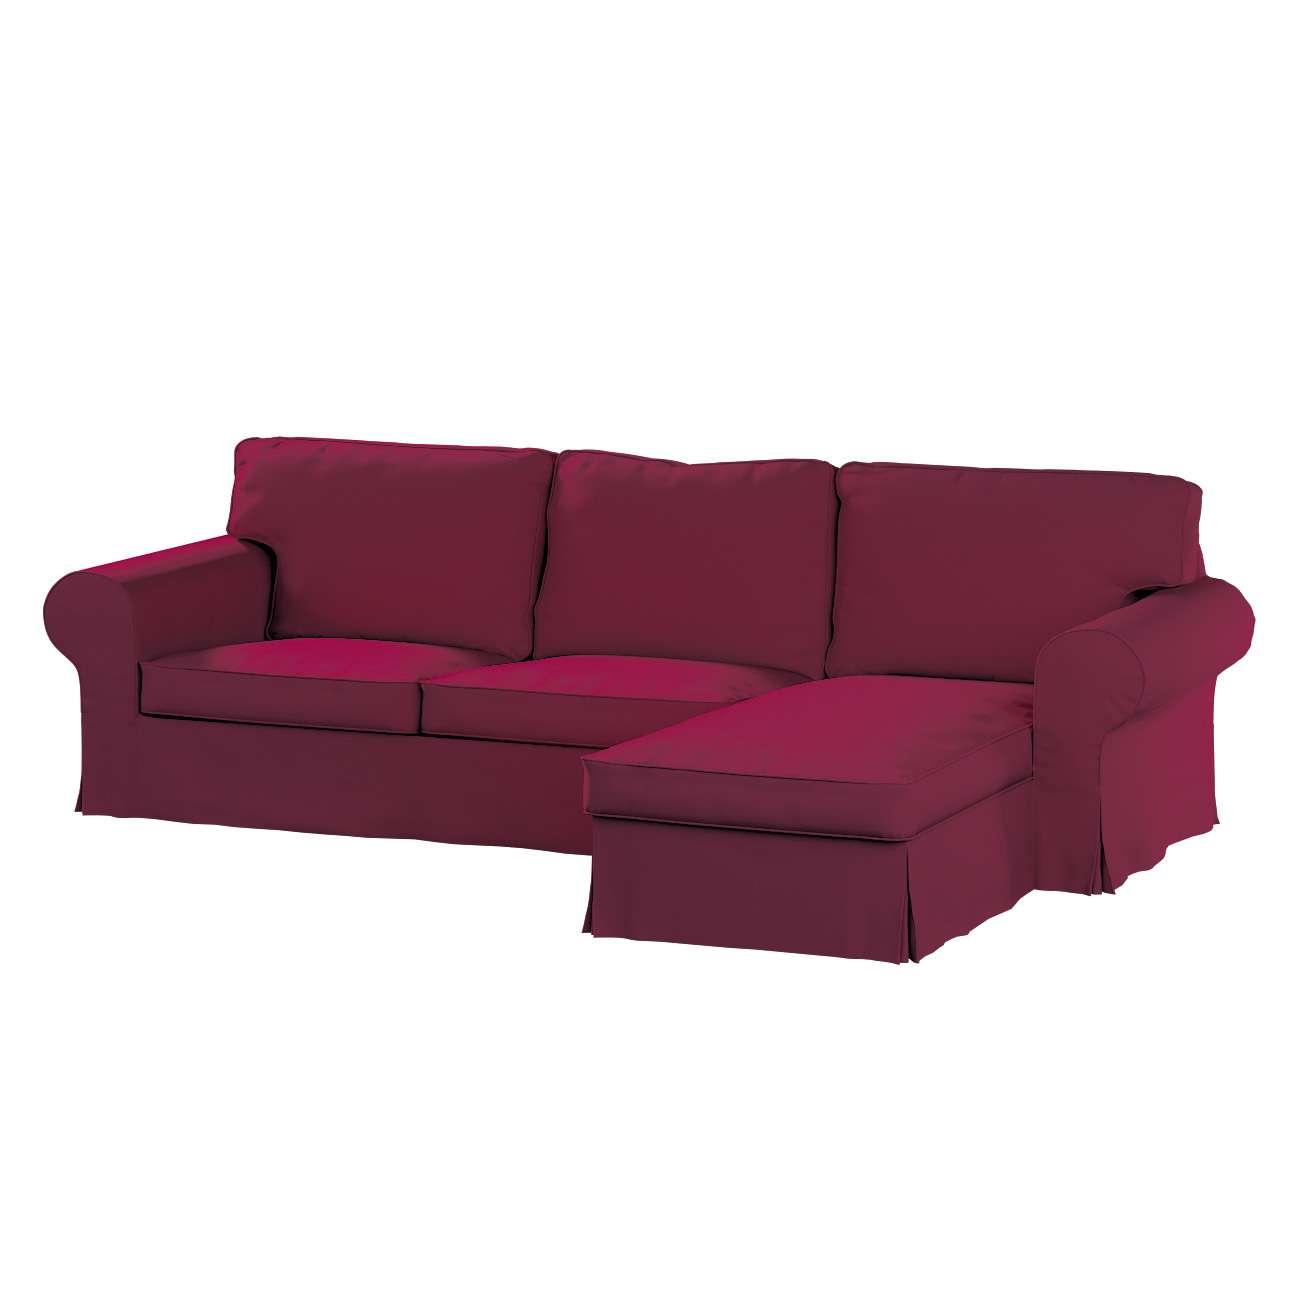 Ektorp 2-Sitzer Sofabezug mit Recamiere Ektorp 2-Sitzer Sofabezug mit Recamiere von der Kollektion Cotton Panama, Stoff: 702-32